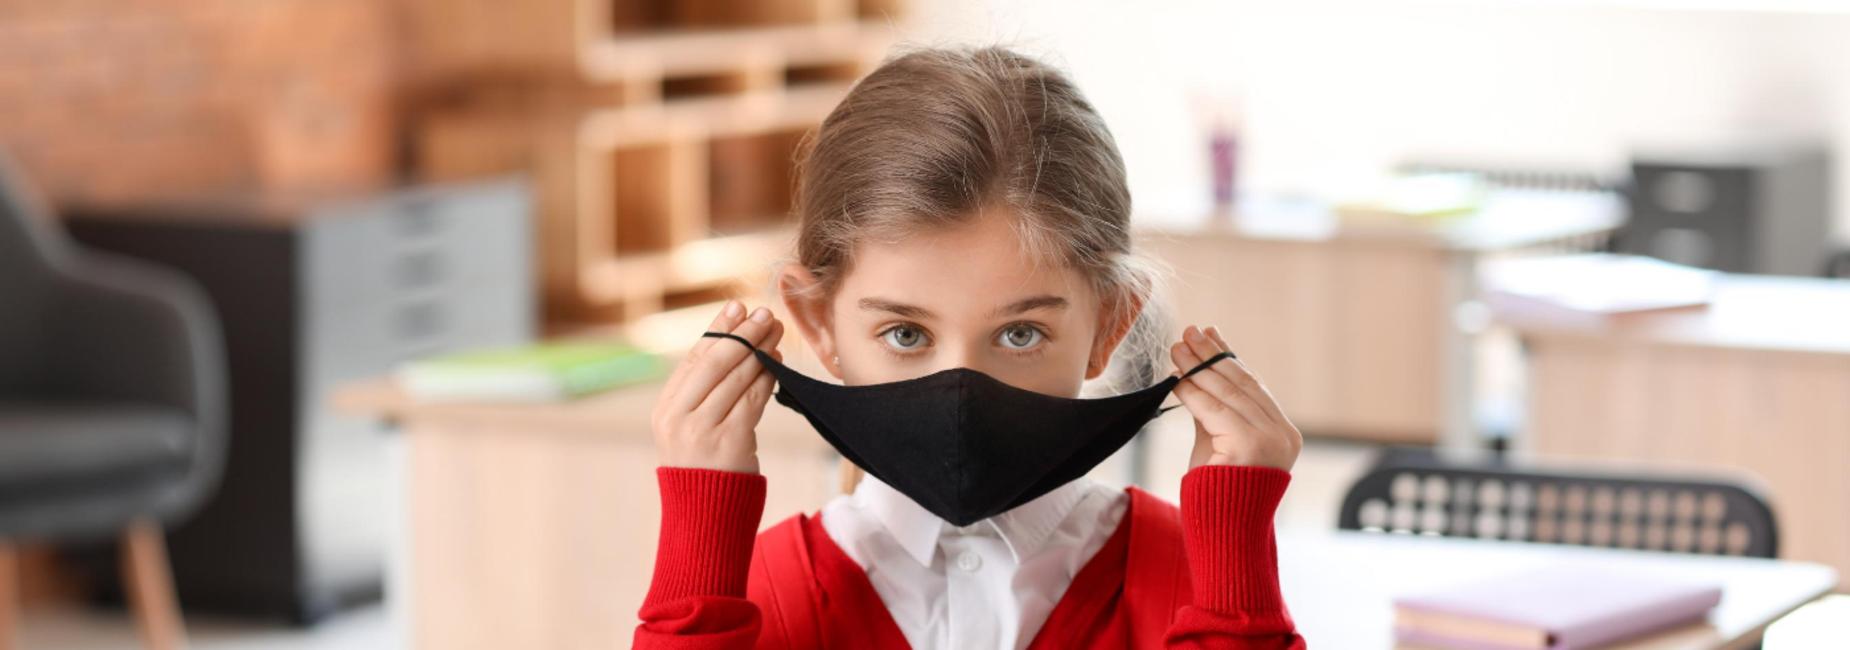 girl putting on mask